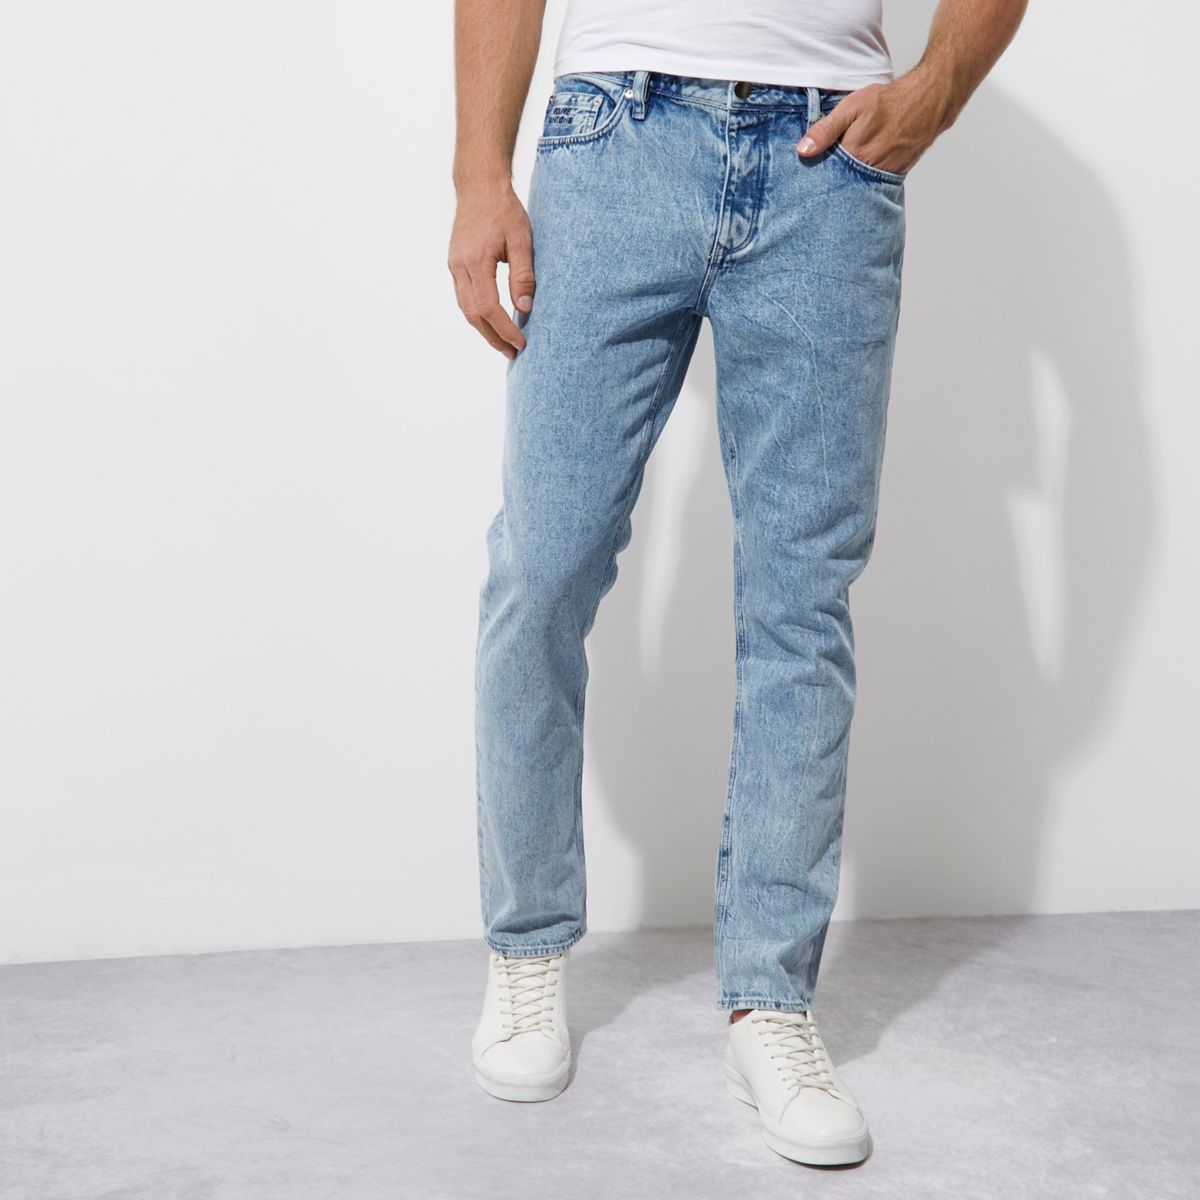 Felipe Pantone – Blaue Jeans